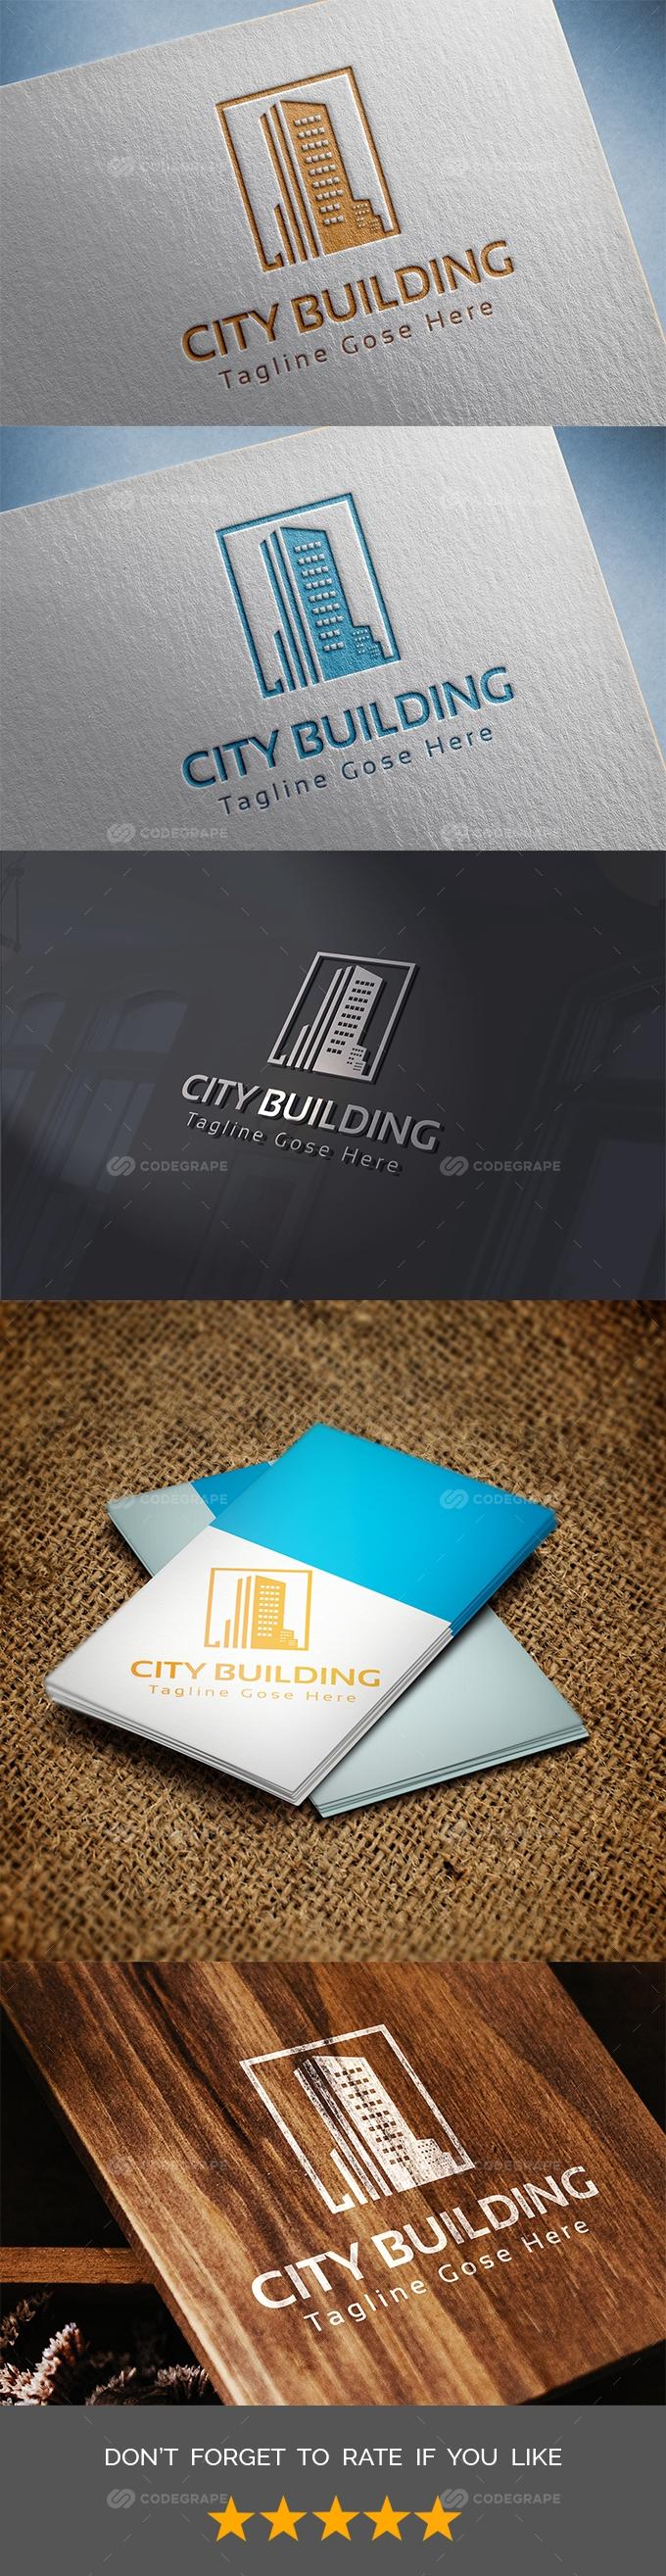 City-Building Logo Templates